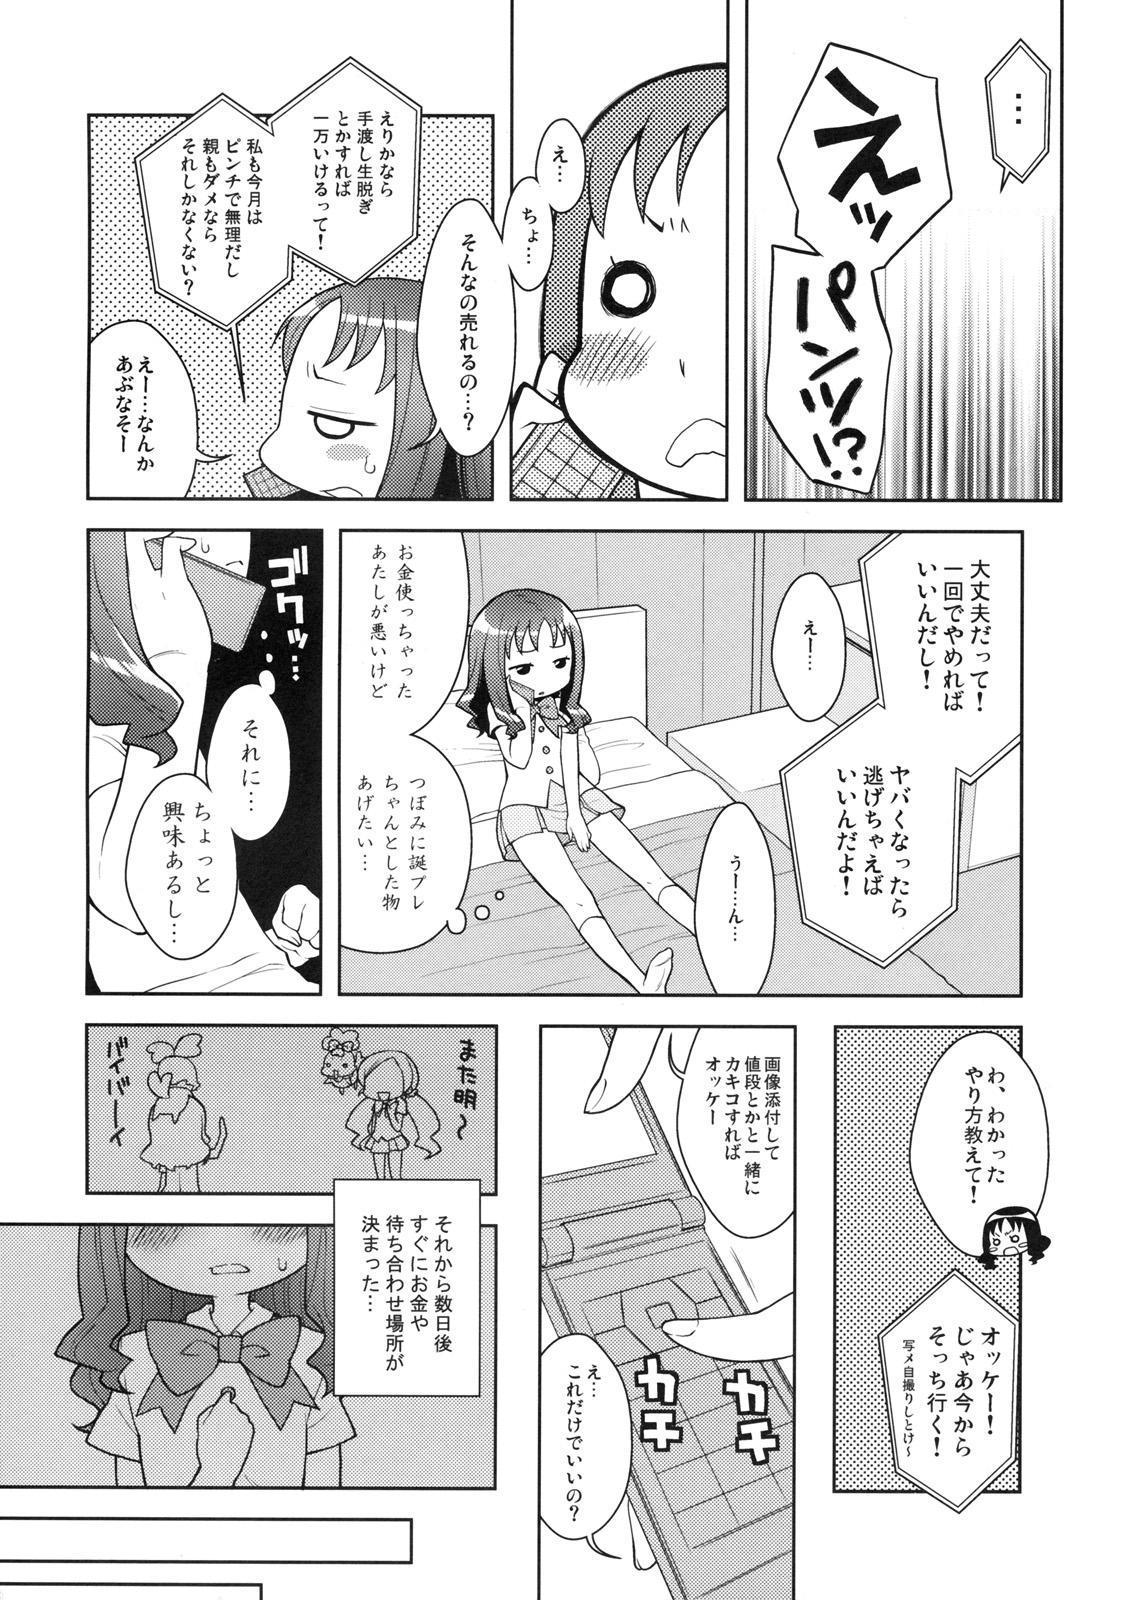 Erika to Nakayoshi Ecchi 4